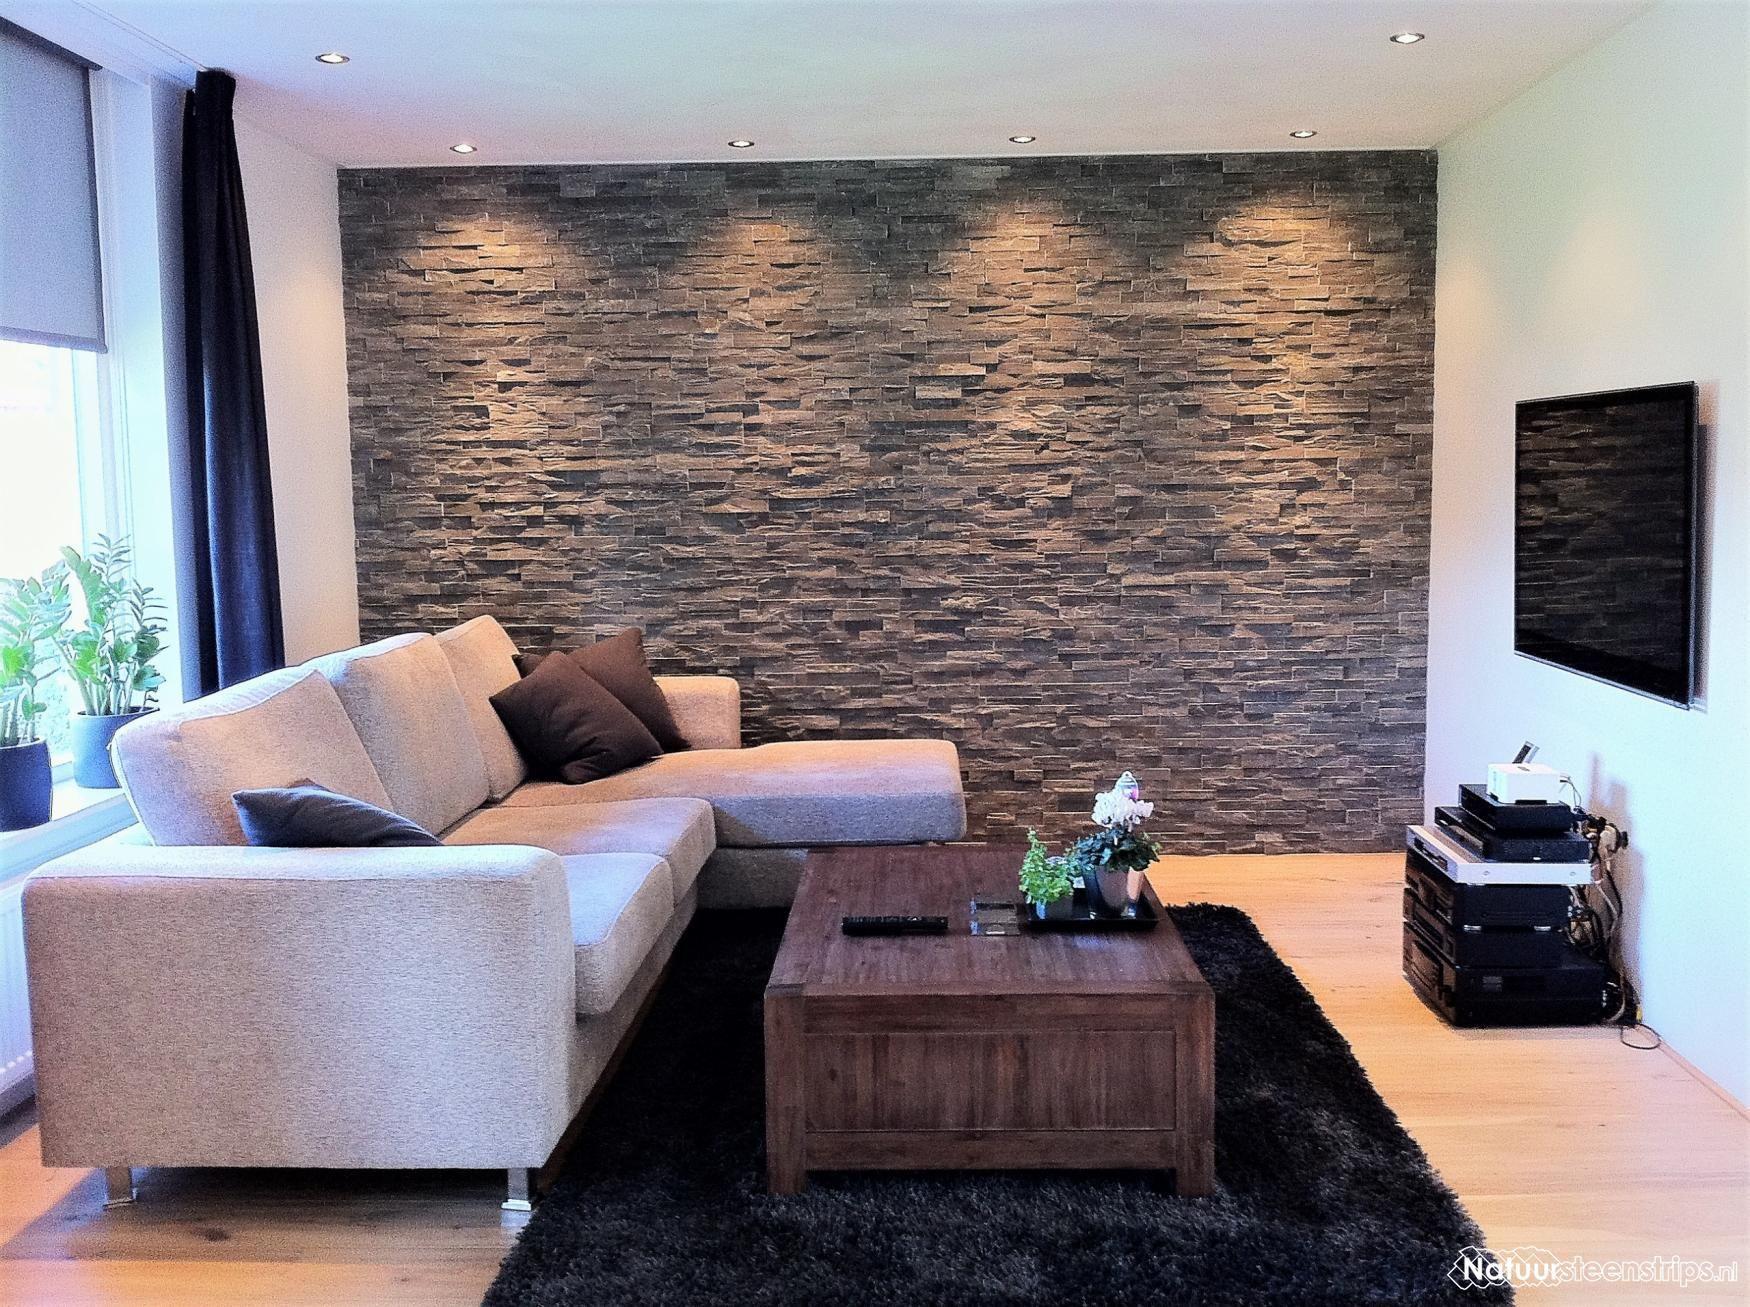 Nieuwste Natuursteenstrips Woonkamer : Steenstrips grijs kwartsiet woonkamer wand diverse wall